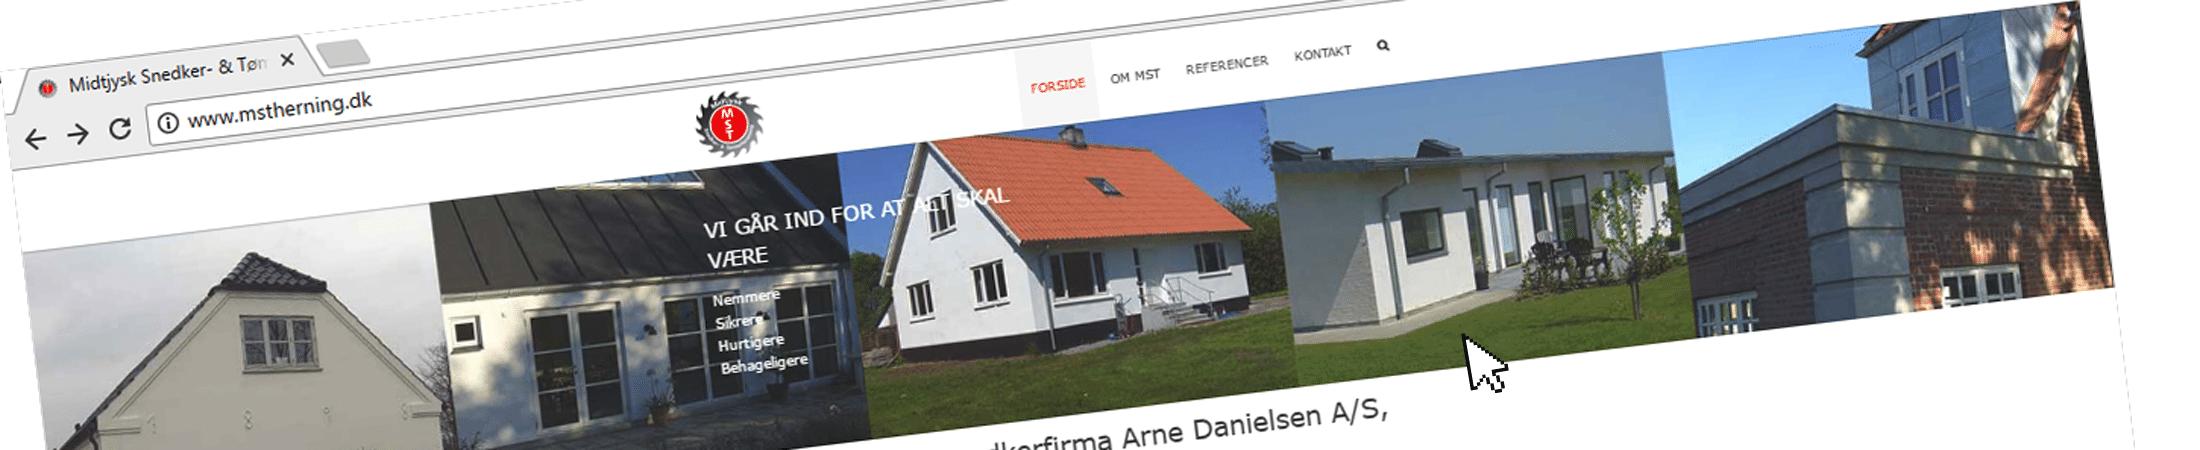 MST / Midtjysk Tømrer- og Snedker